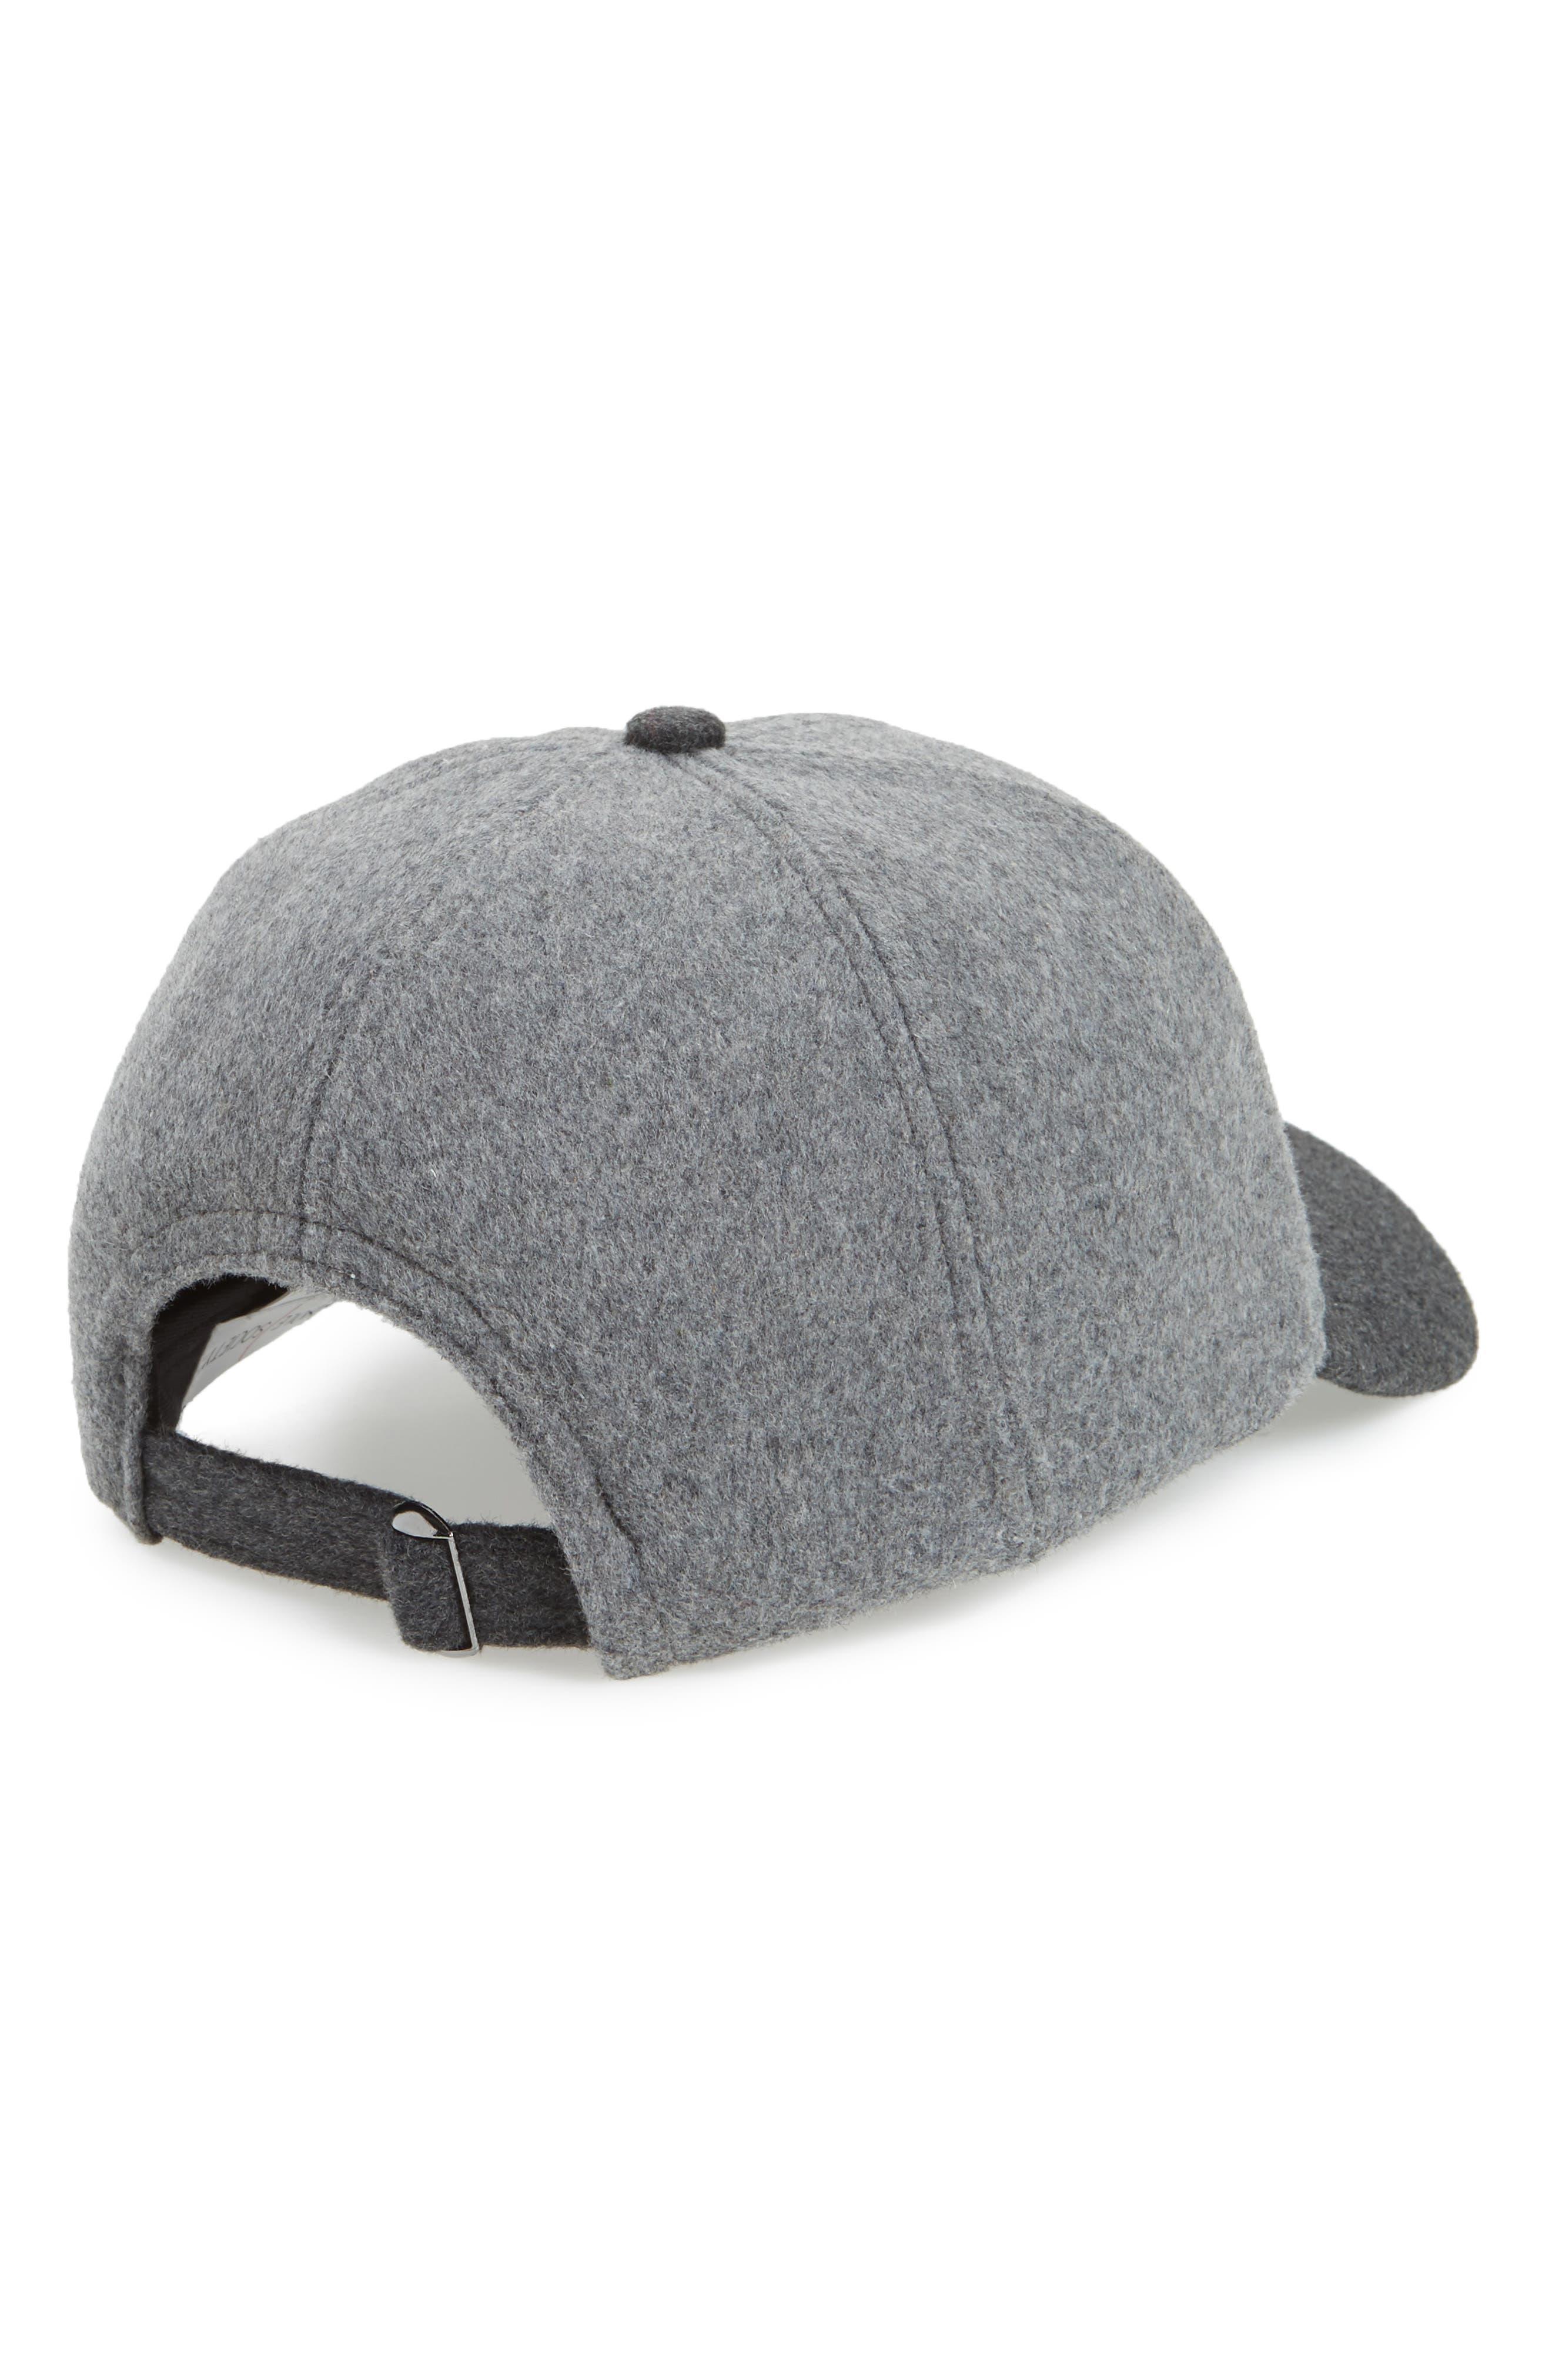 Two-Tone Baseball Cap,                             Alternate thumbnail 2, color,                             Grey Combo